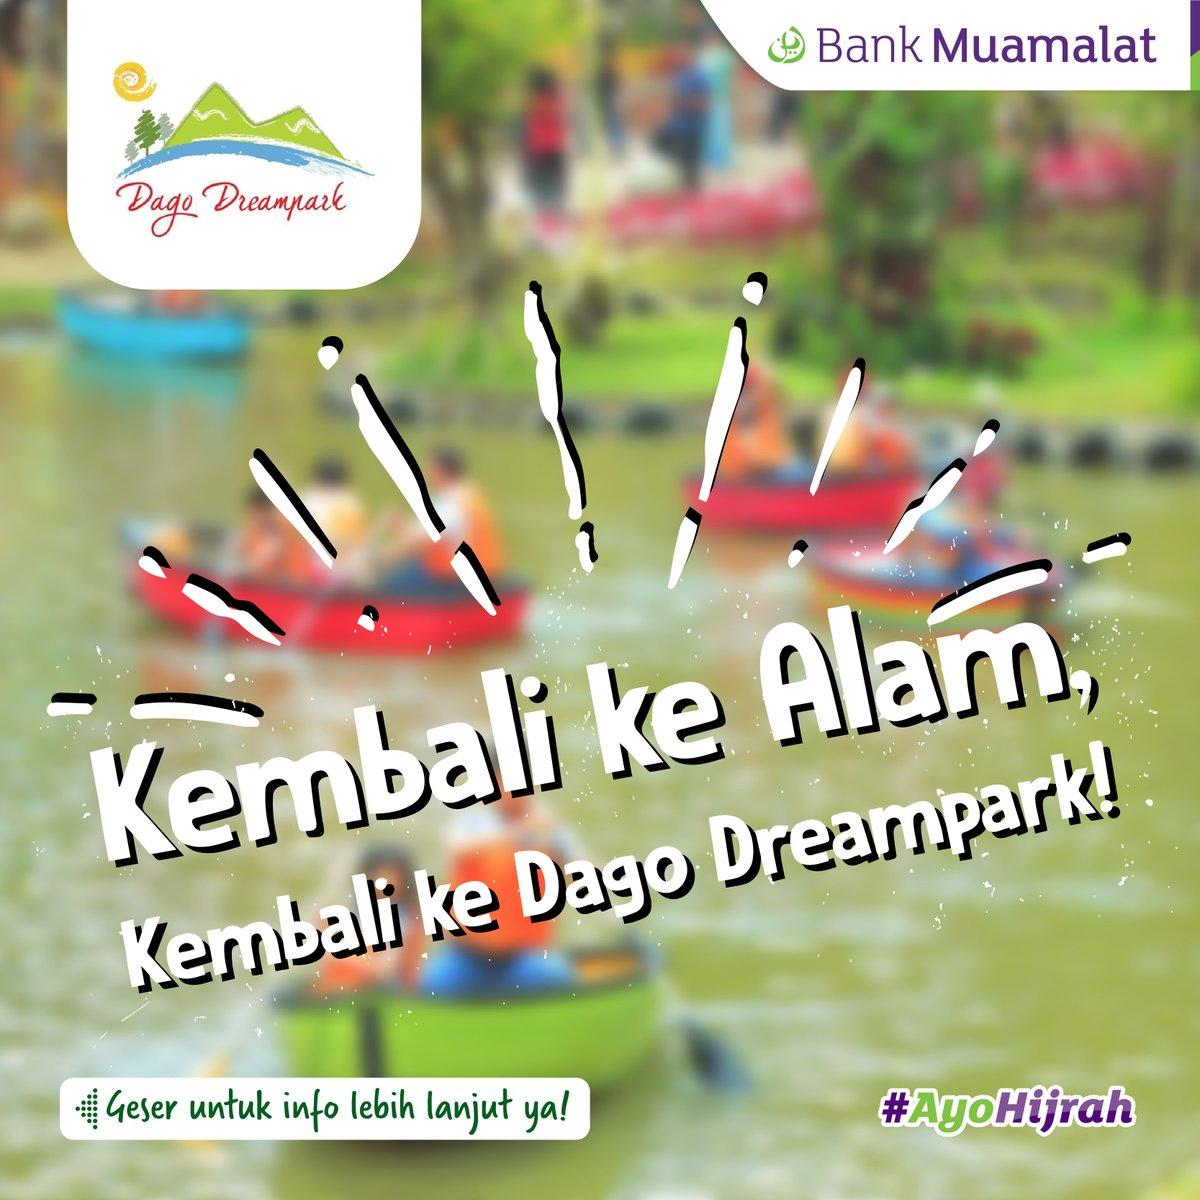 Bank Muamalat - Promo Dago Dreampark Gratis Tiket Wahana 20 Ribu Min Transaksi 100 Ribu